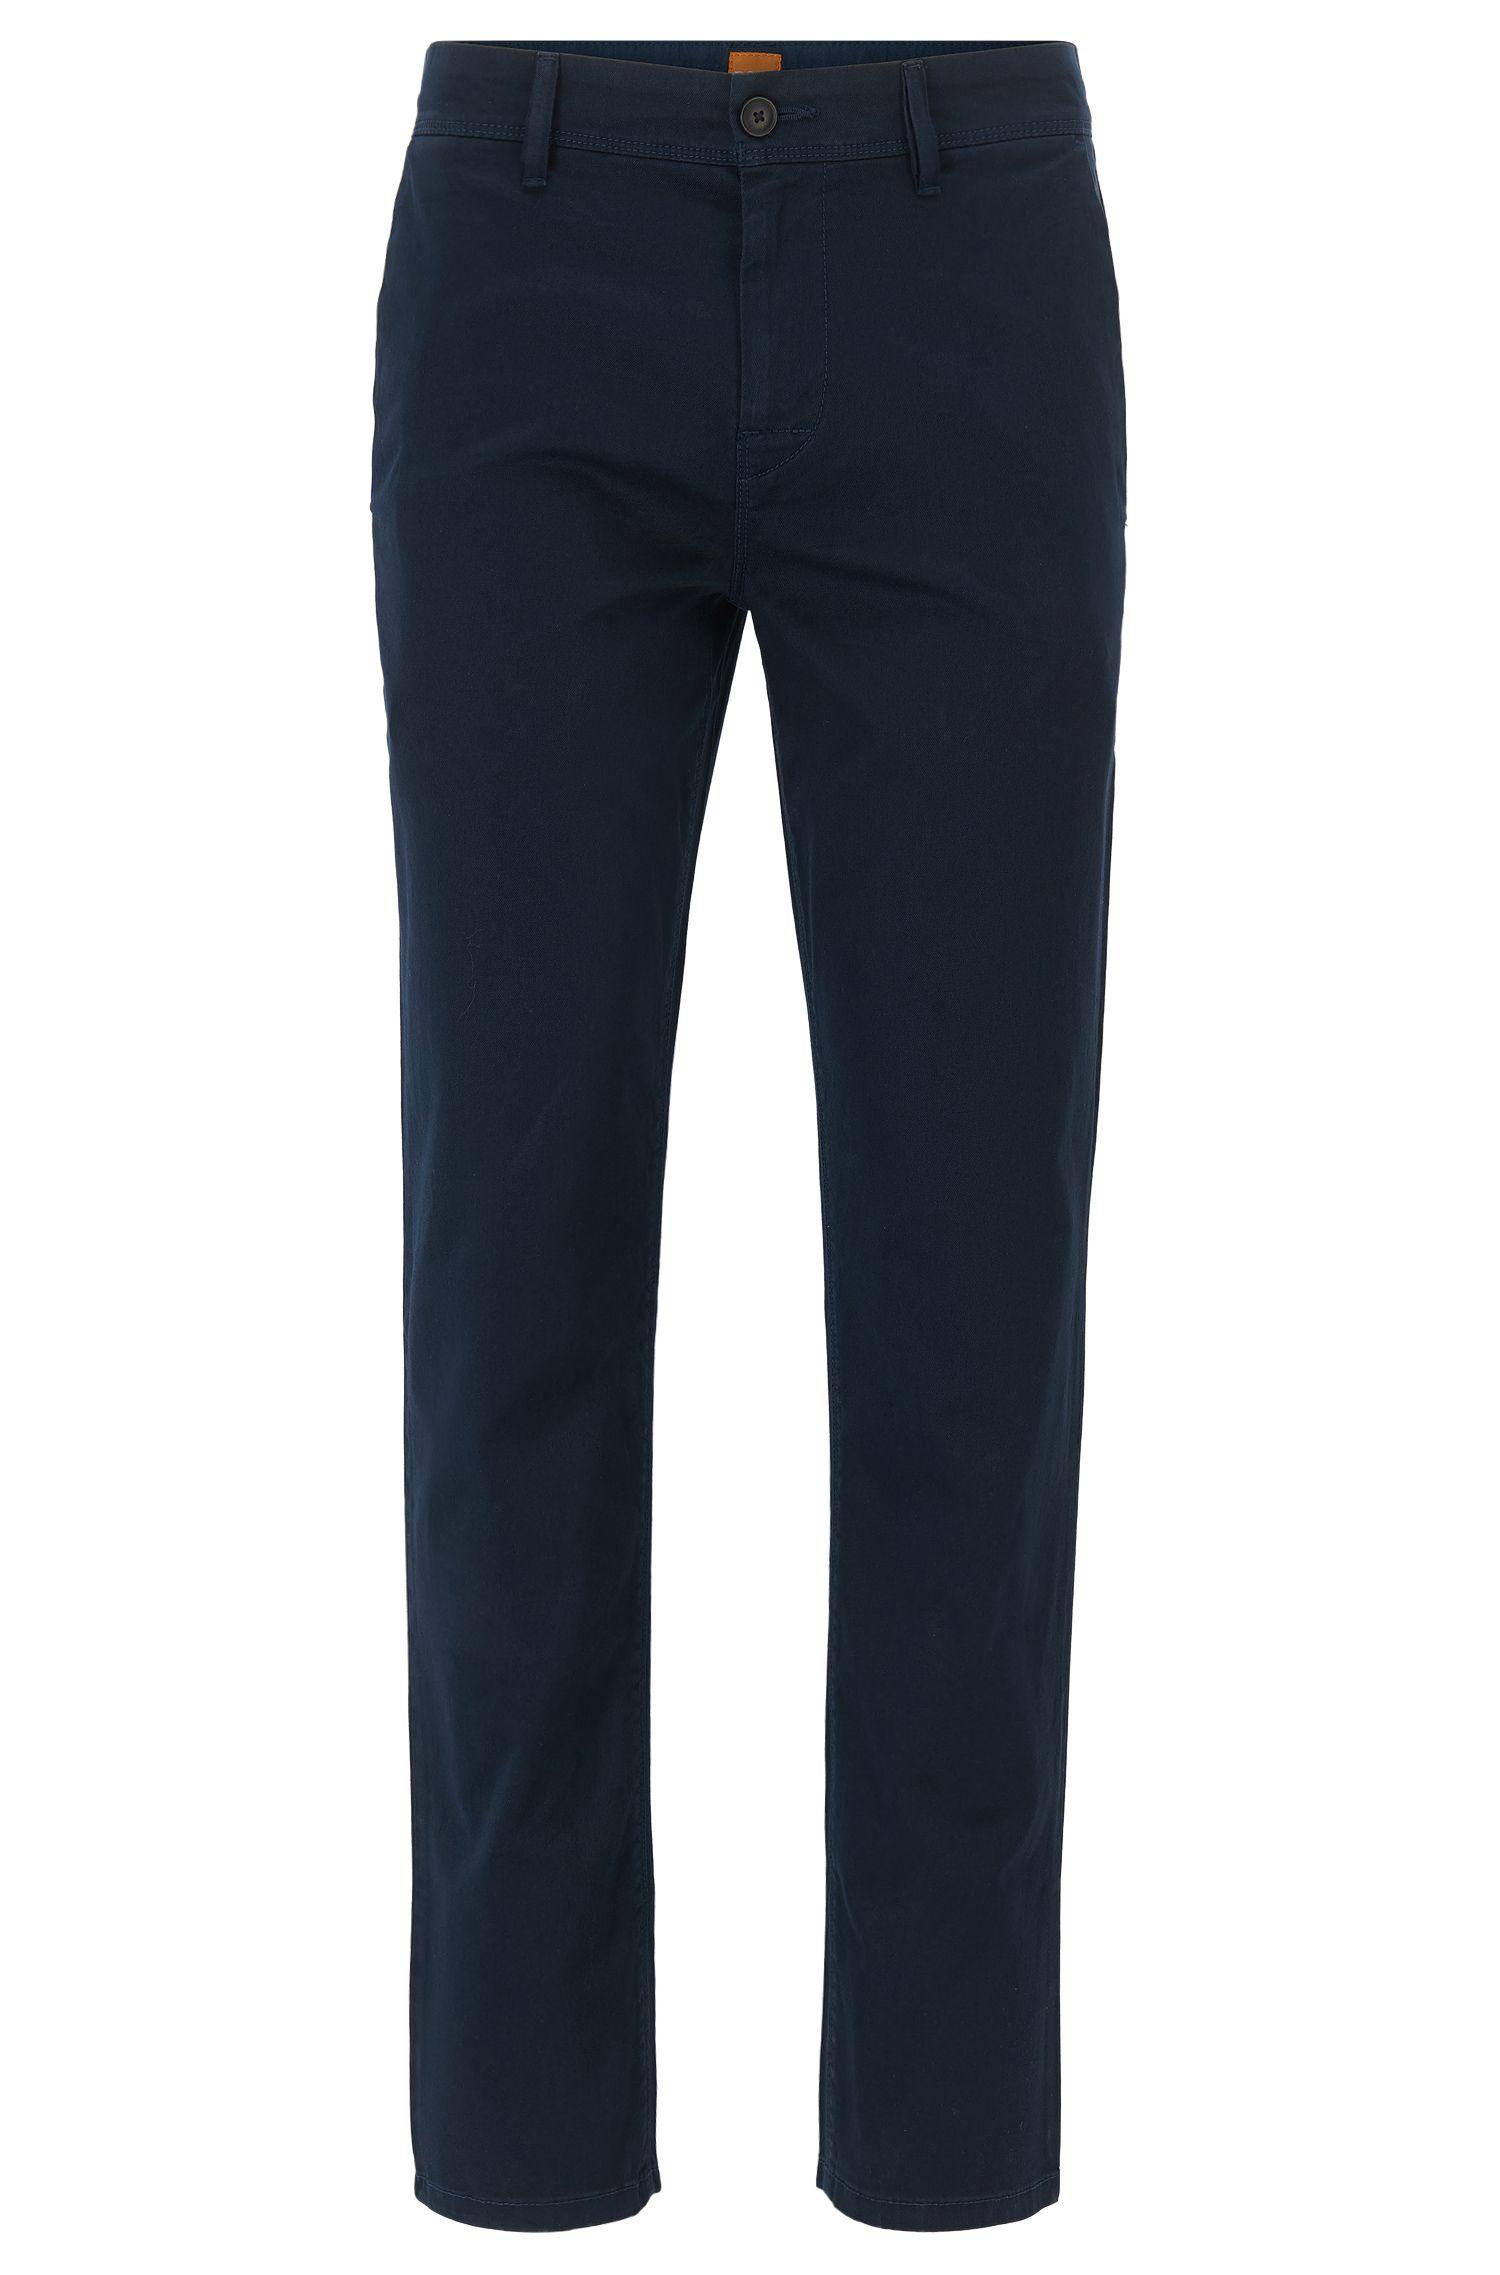 Pantalon Tapered Fit en coton stretch